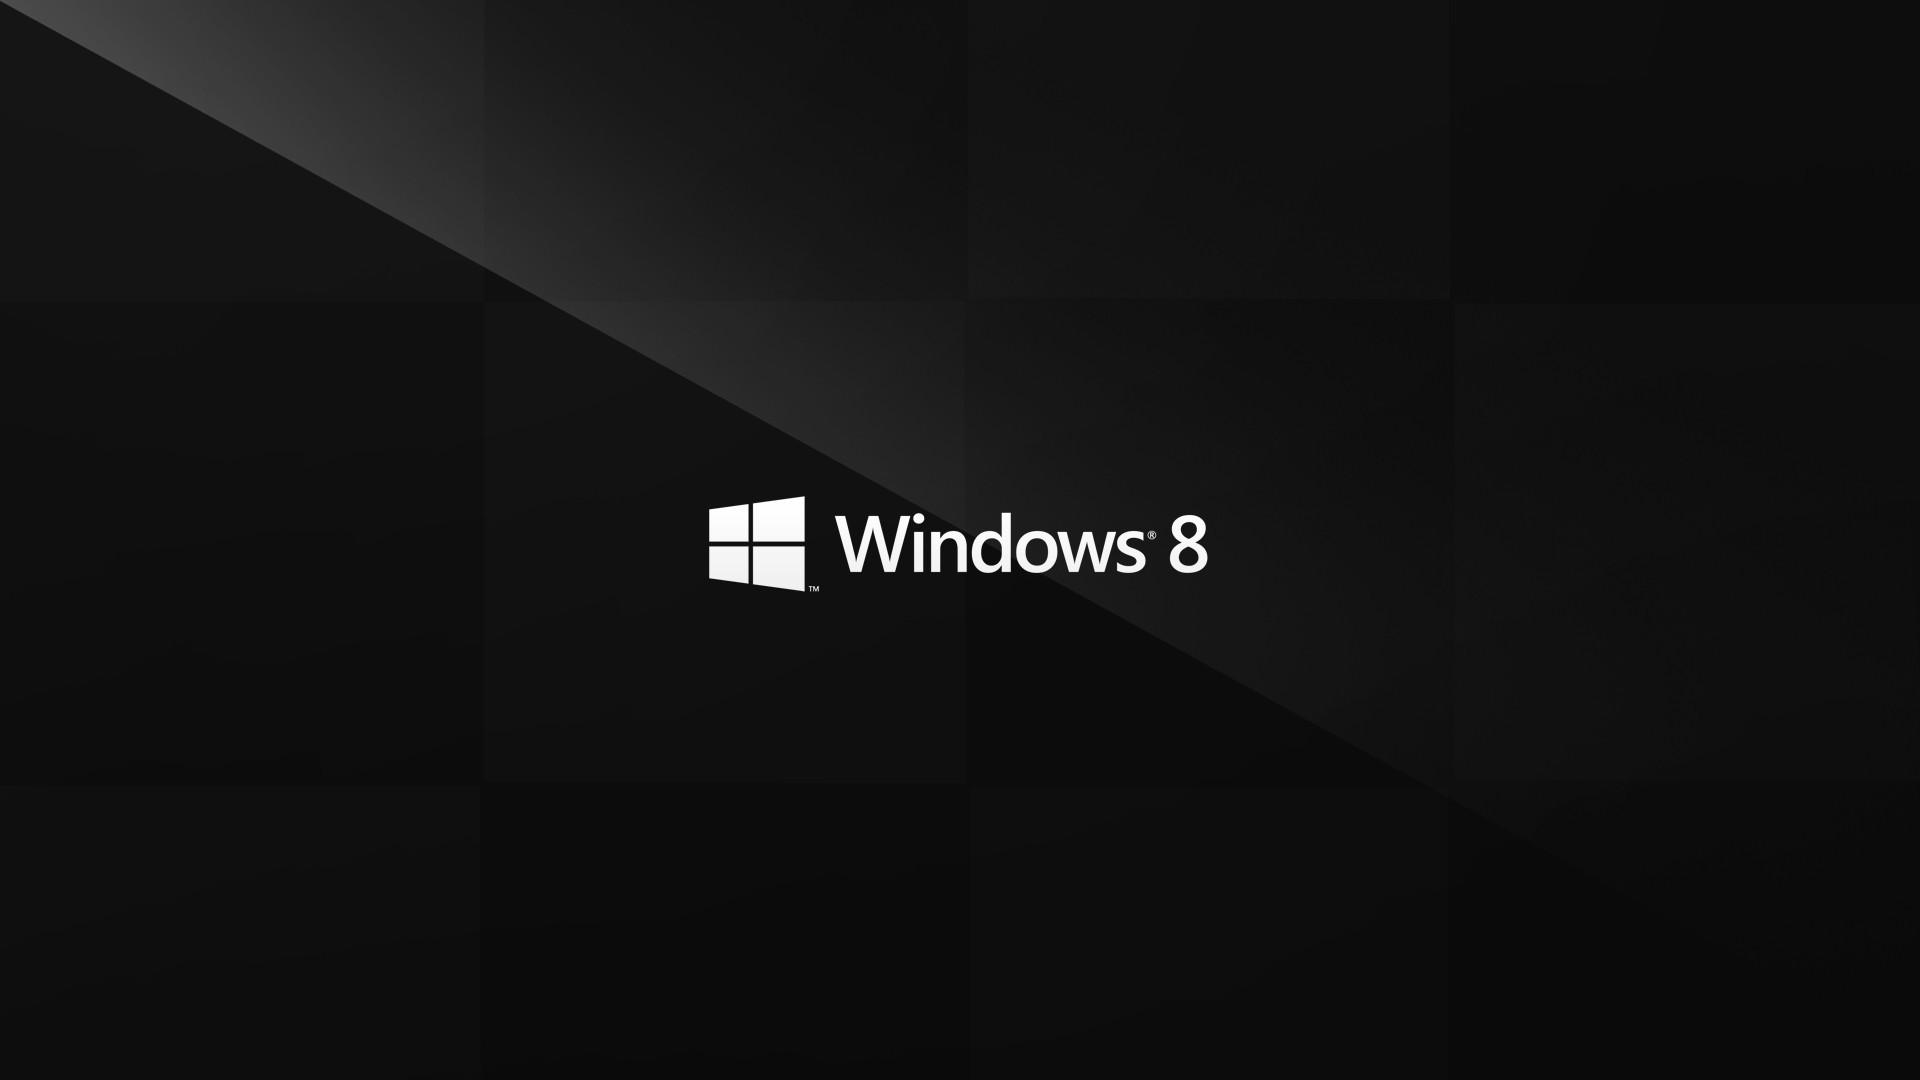 Abstract Wallpaper: Windows Carbon Fiber Iphone Wallpaper for .